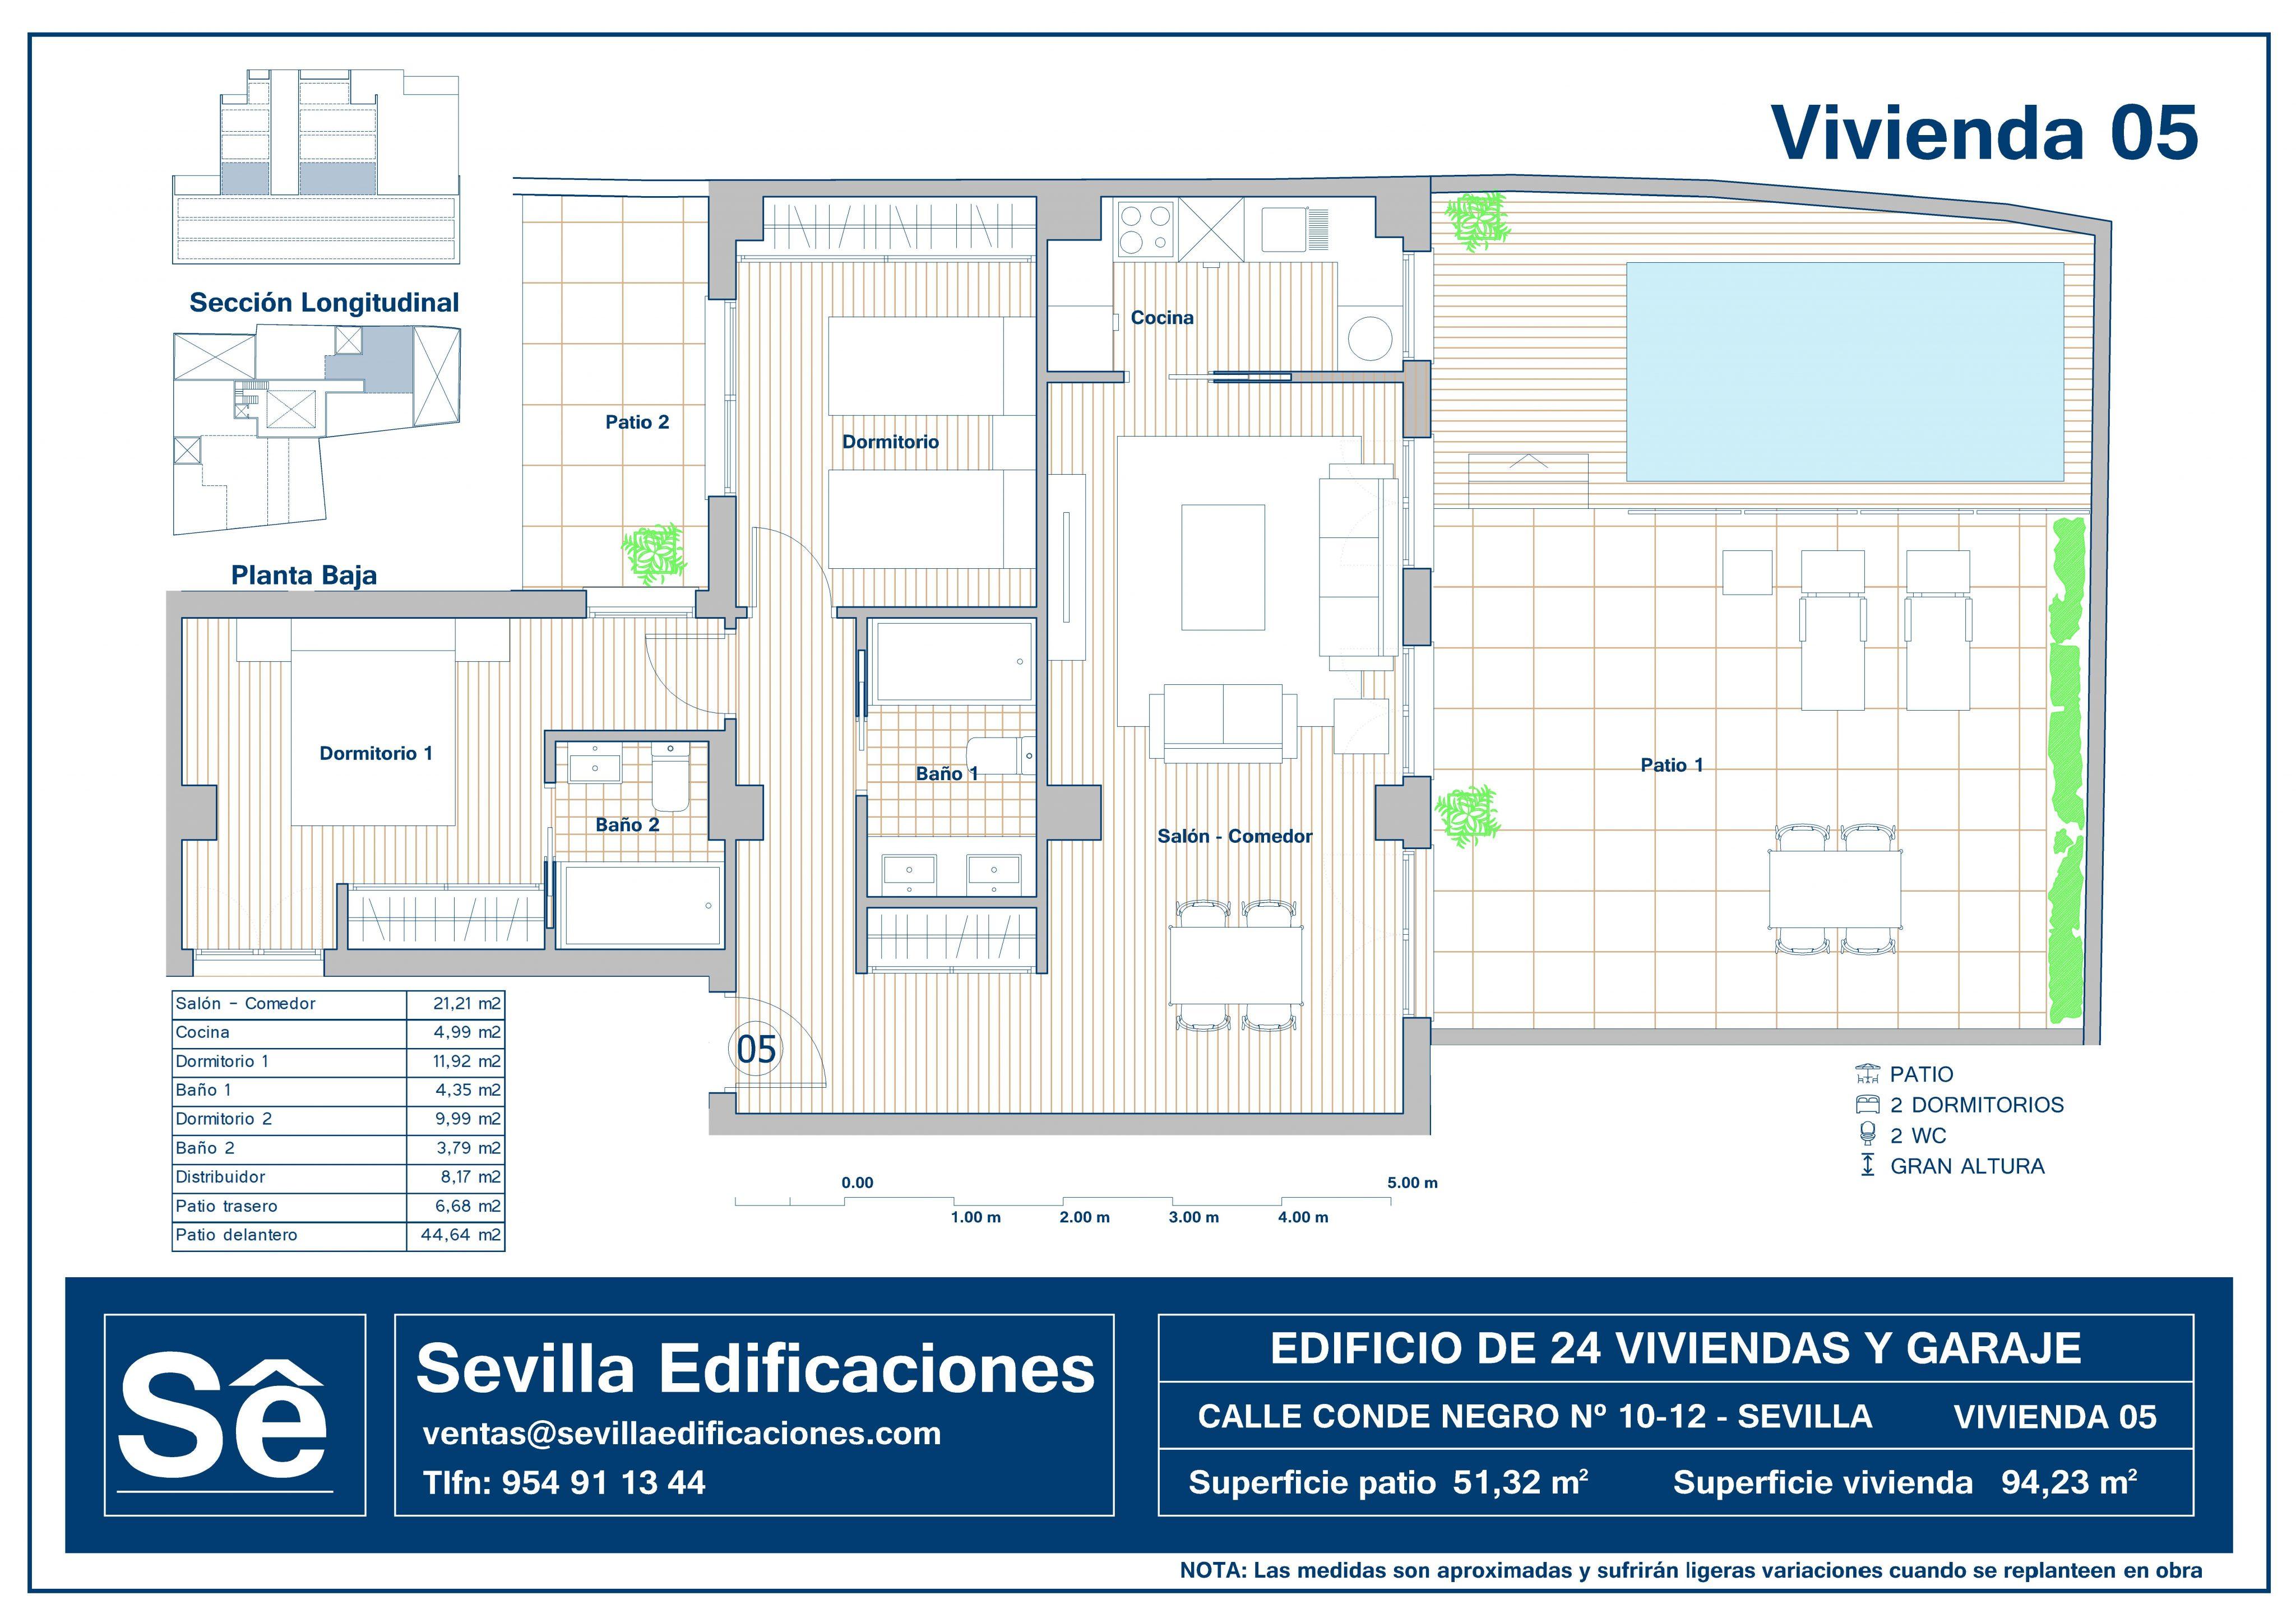 CONDENEGRO_VIVIENDA_05